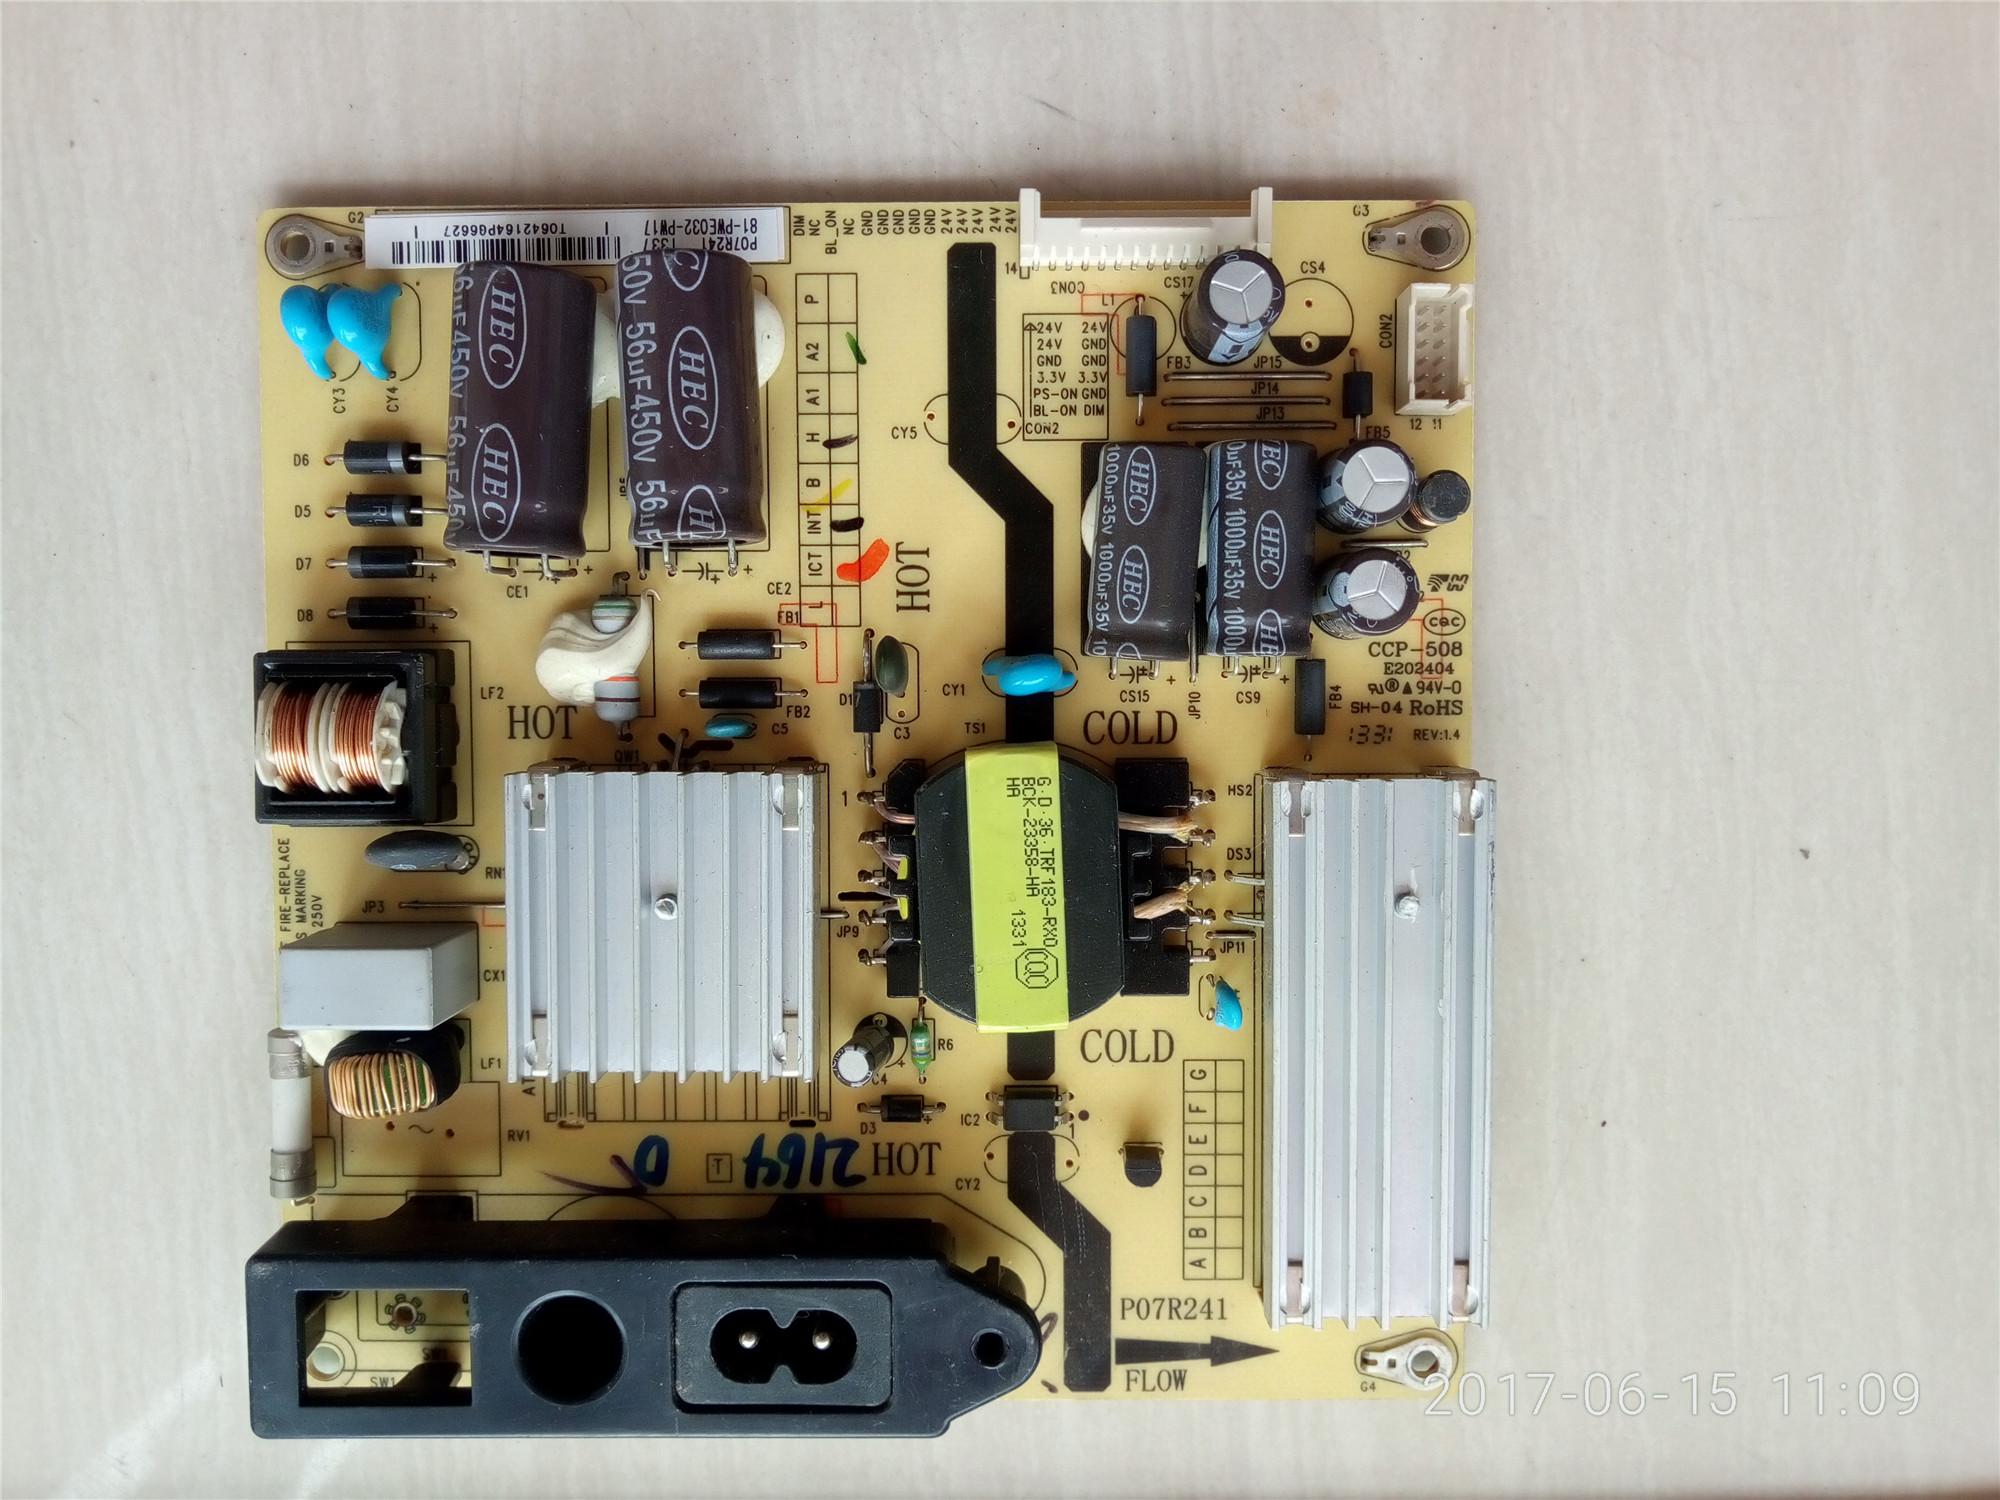 TCLL32F1570B32 - Zoll - HD - LCD fernseher Power Board my664 hintergrundbeleuchtung stromversorgung - Aufsichtsrat